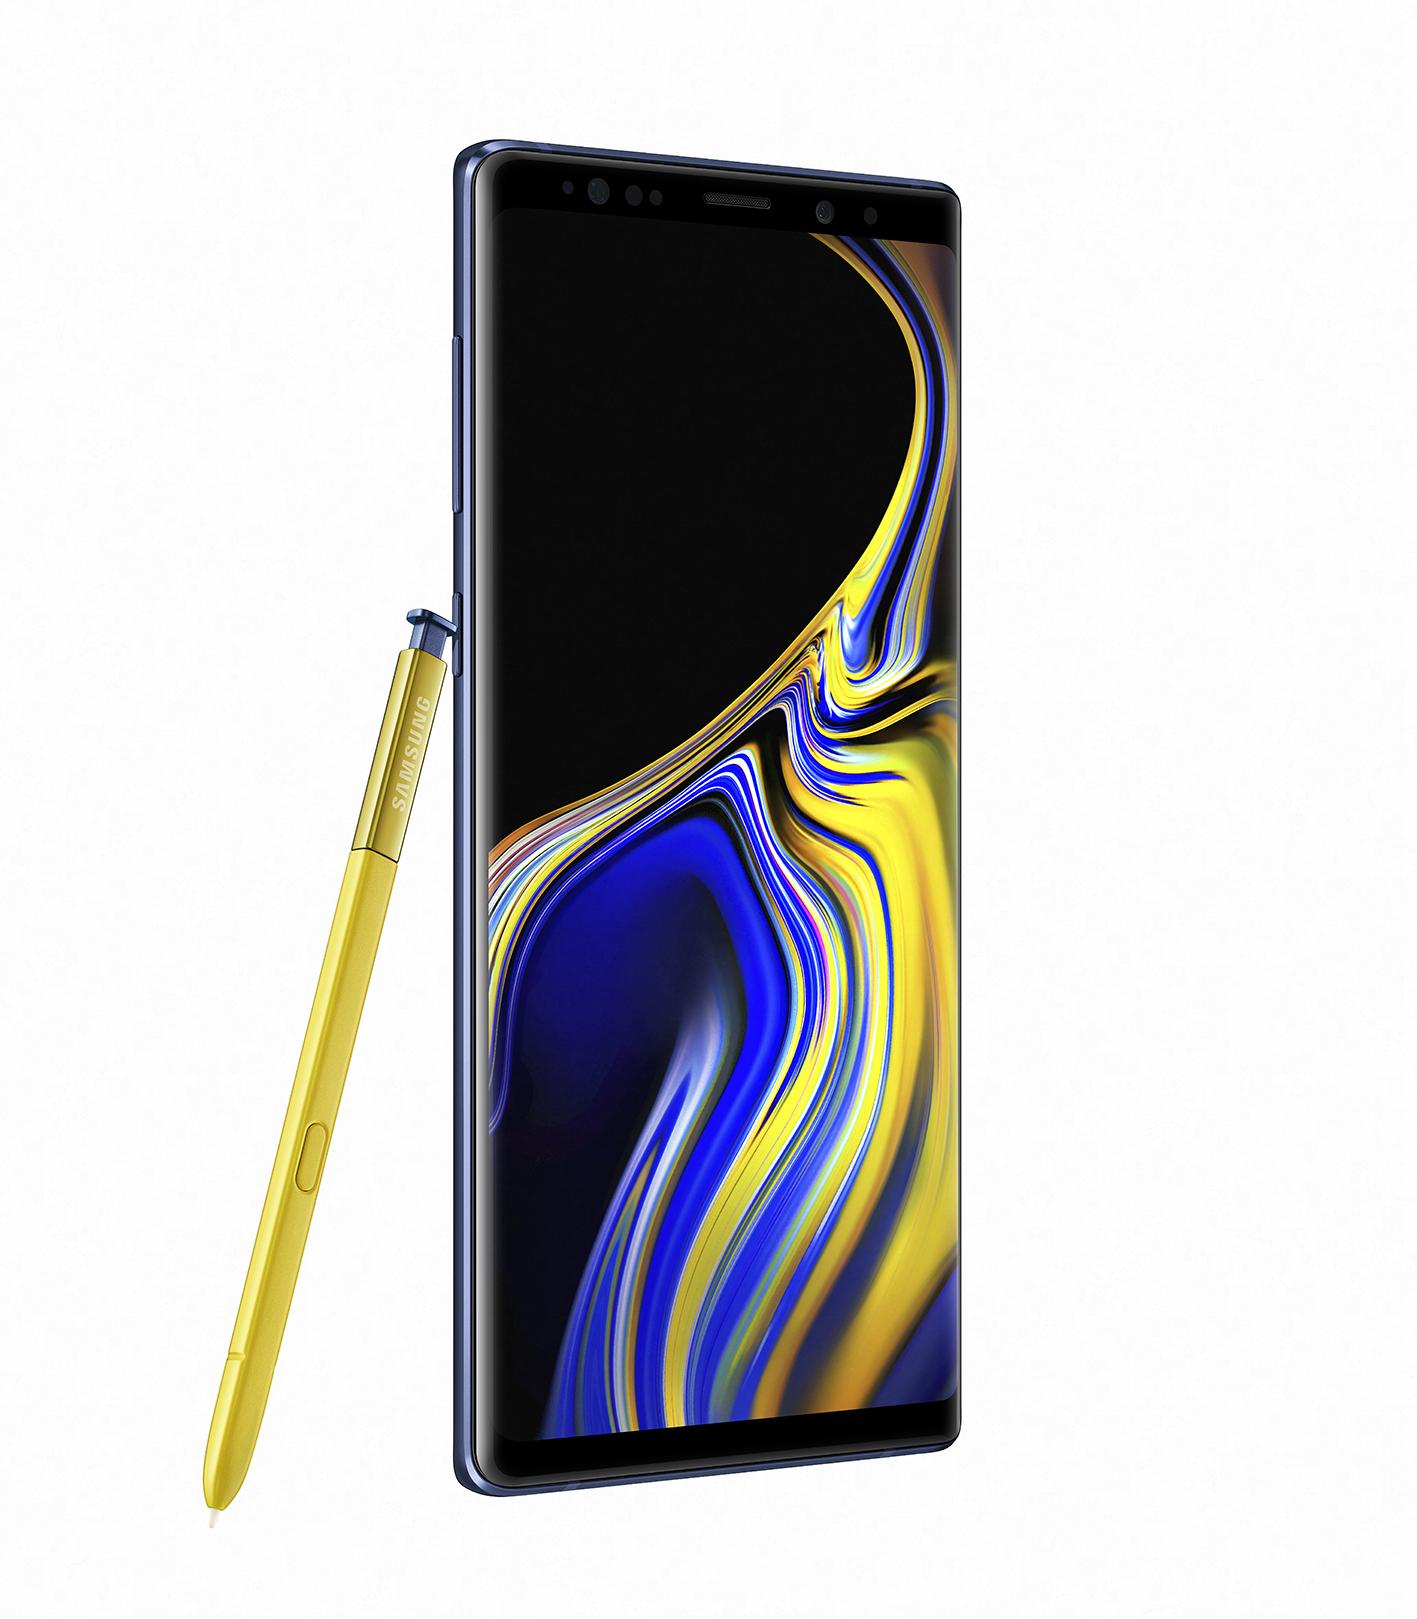 Galaxy Note9 Ocean Blue 3 - Galaxy-Note9-Ocean-Blue_3